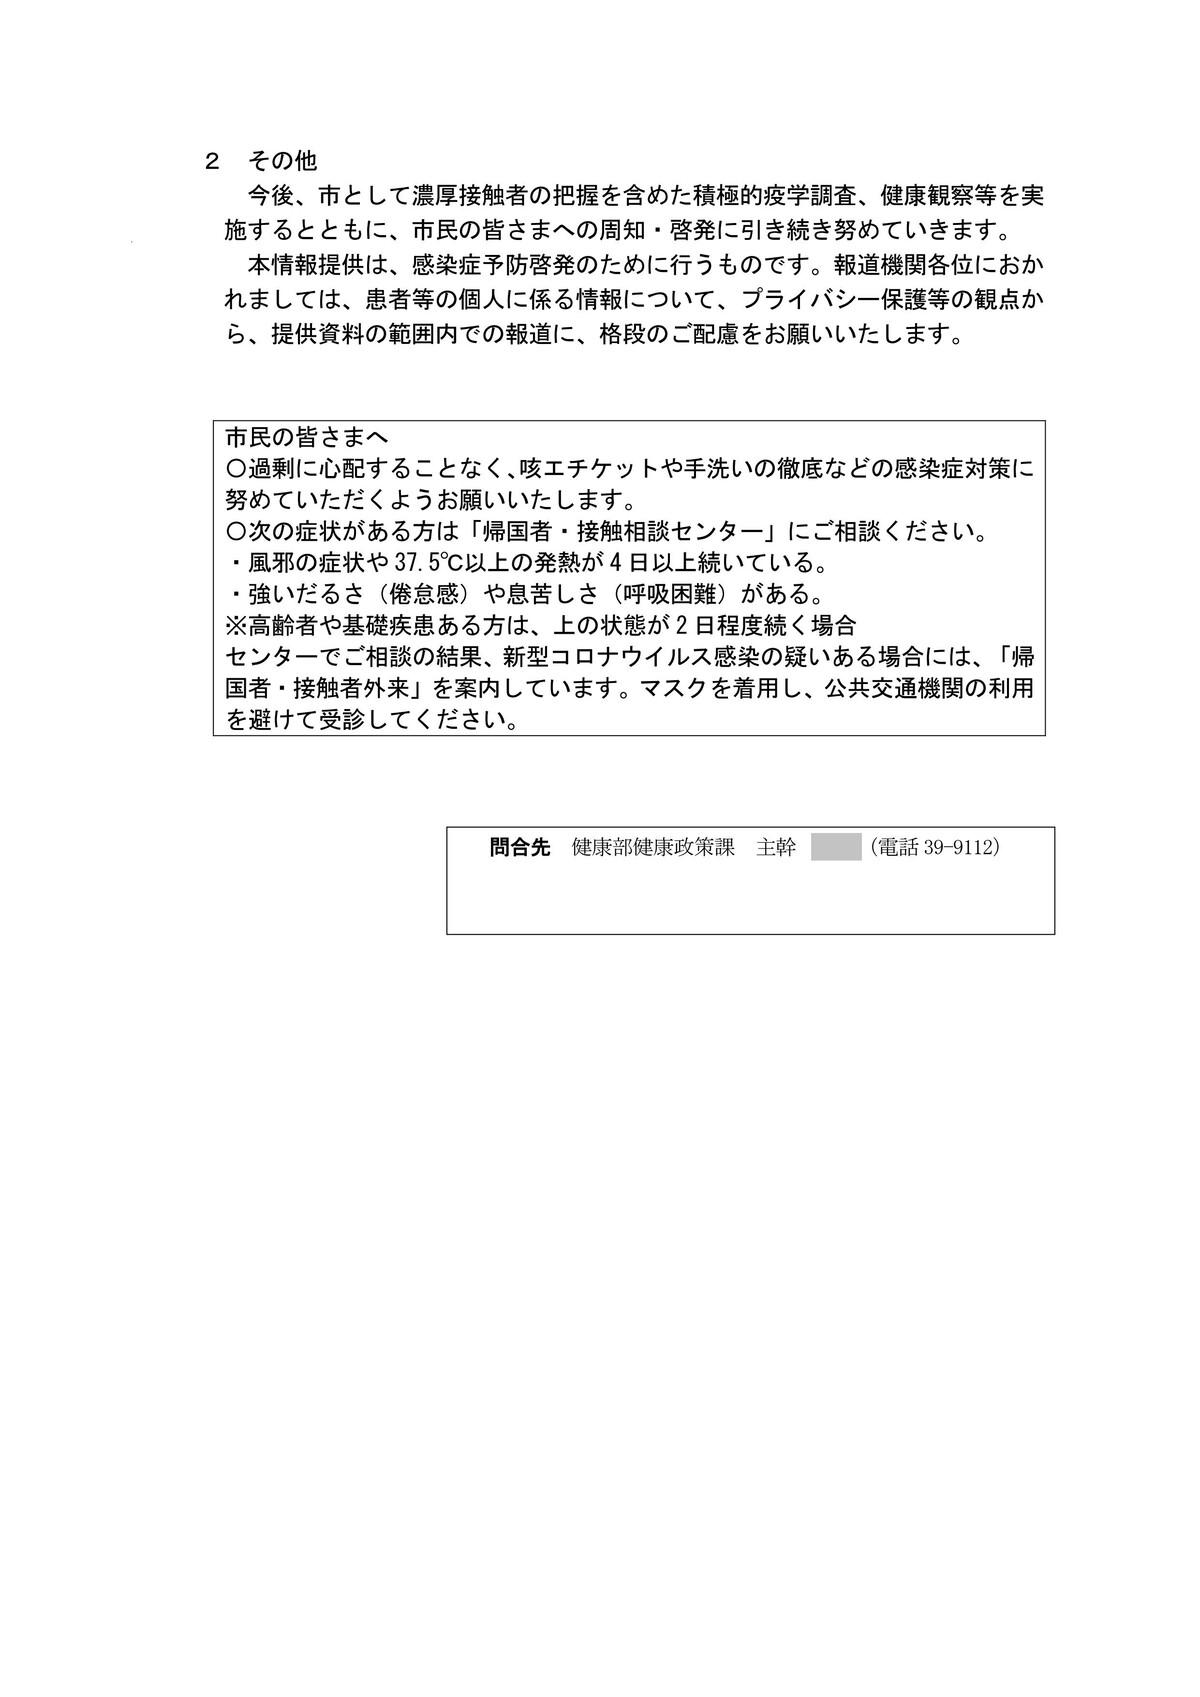 200402_R020402_03